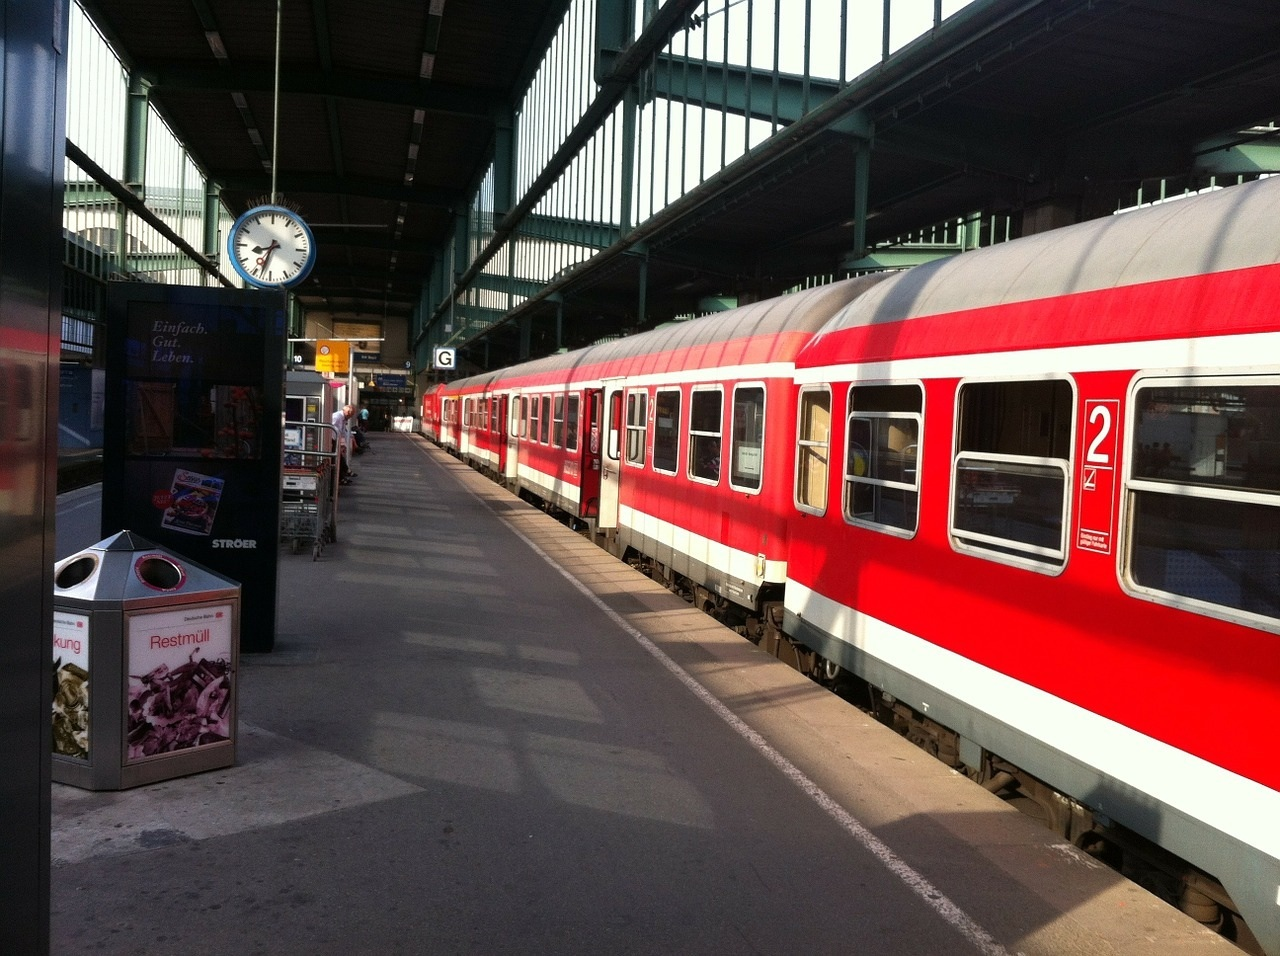 train station-169989_1280